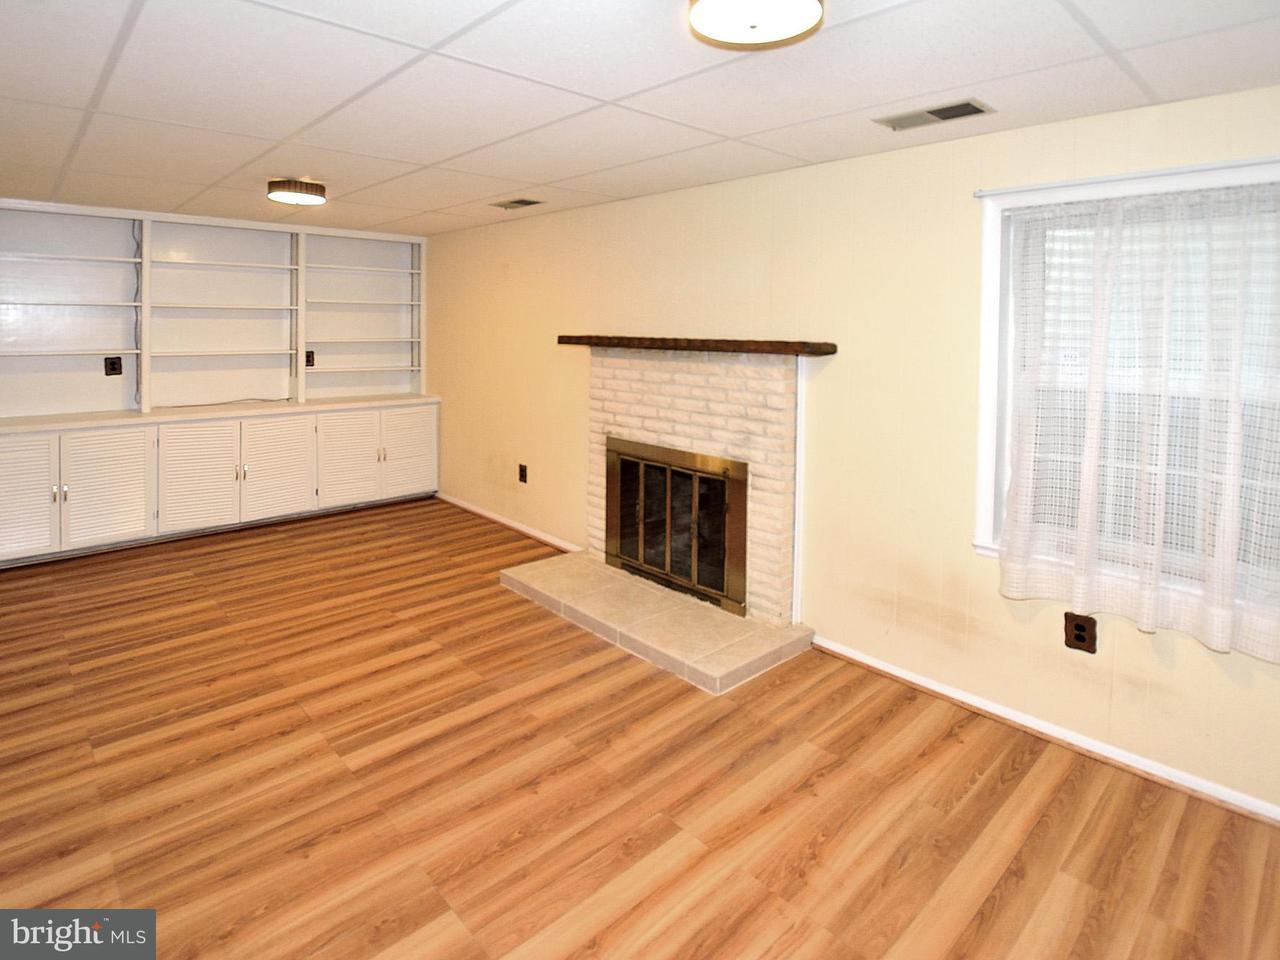 Additional photo for property listing at 3901 Wilcoxson Drive 3901 Wilcoxson Drive Fairfax, Virginia 22031 Estados Unidos